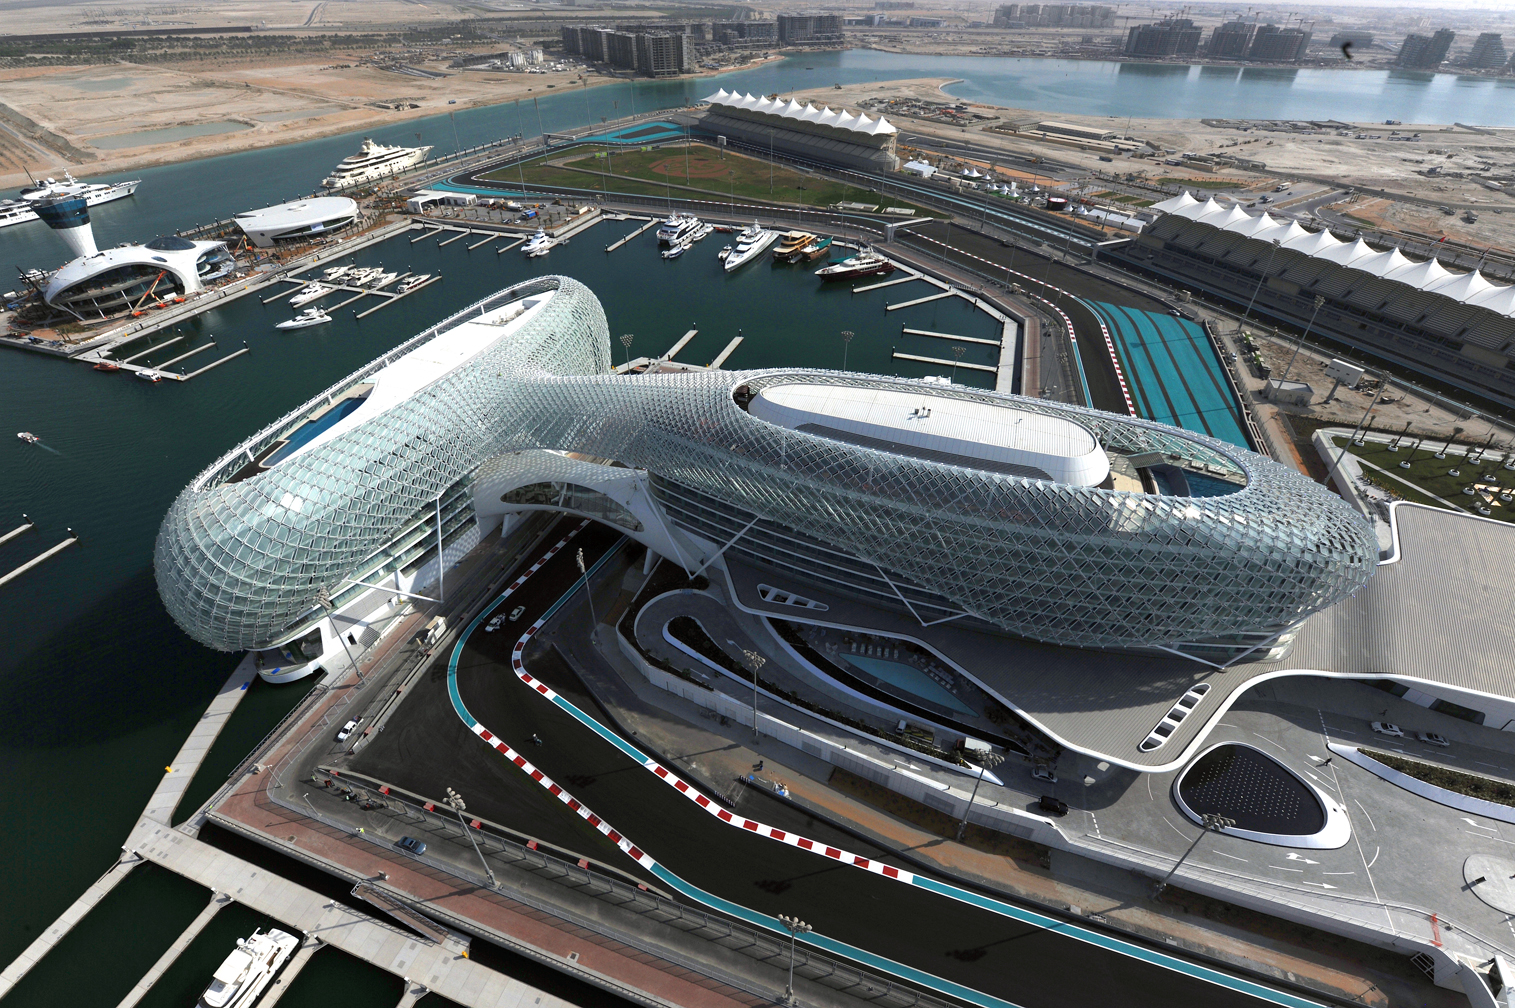 yas marina is venue for 2014 formula 1 etihad airways abu dhabi grand prix the howorths the. Black Bedroom Furniture Sets. Home Design Ideas